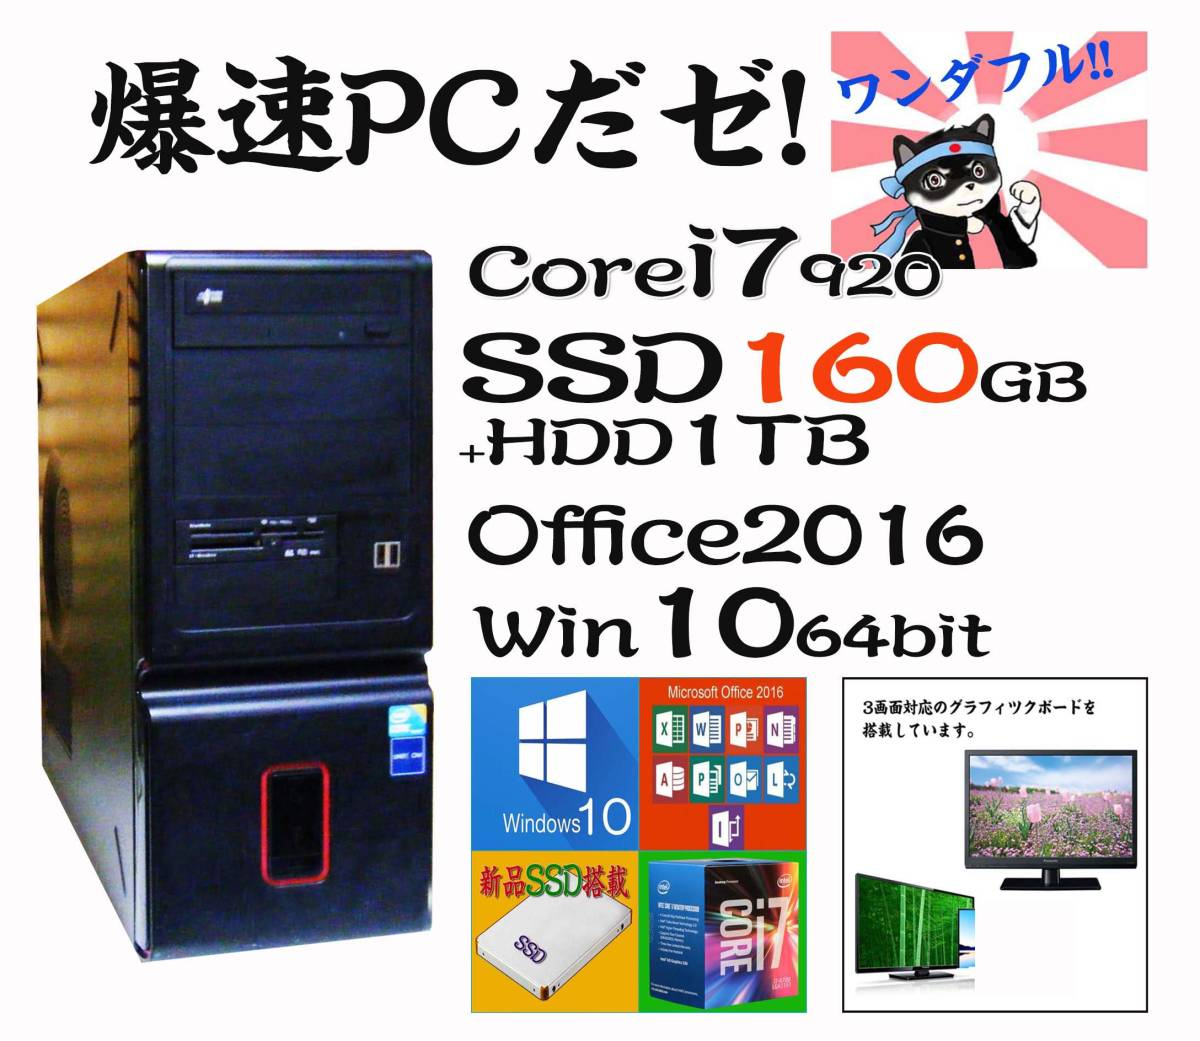 ◆ 秒速/i7 920/自作PMSI X58 ProE/新品SSD 160GB/HDD 1TB/Office2016/Win10Pro ◆